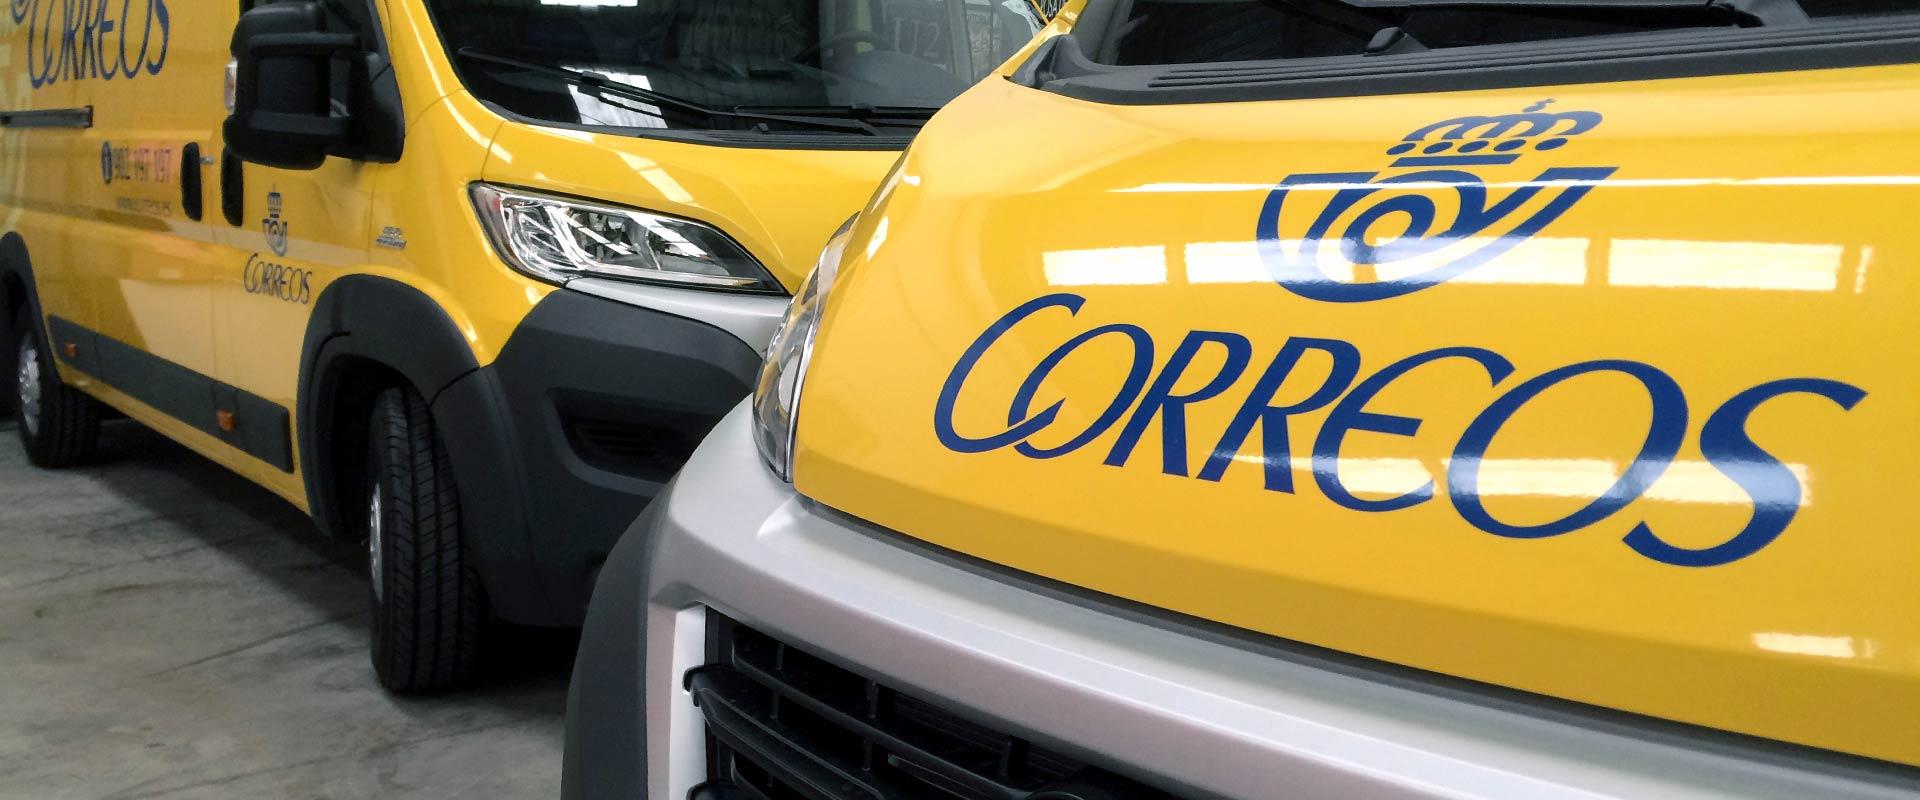 rotulación de flota de vehículos para Correos